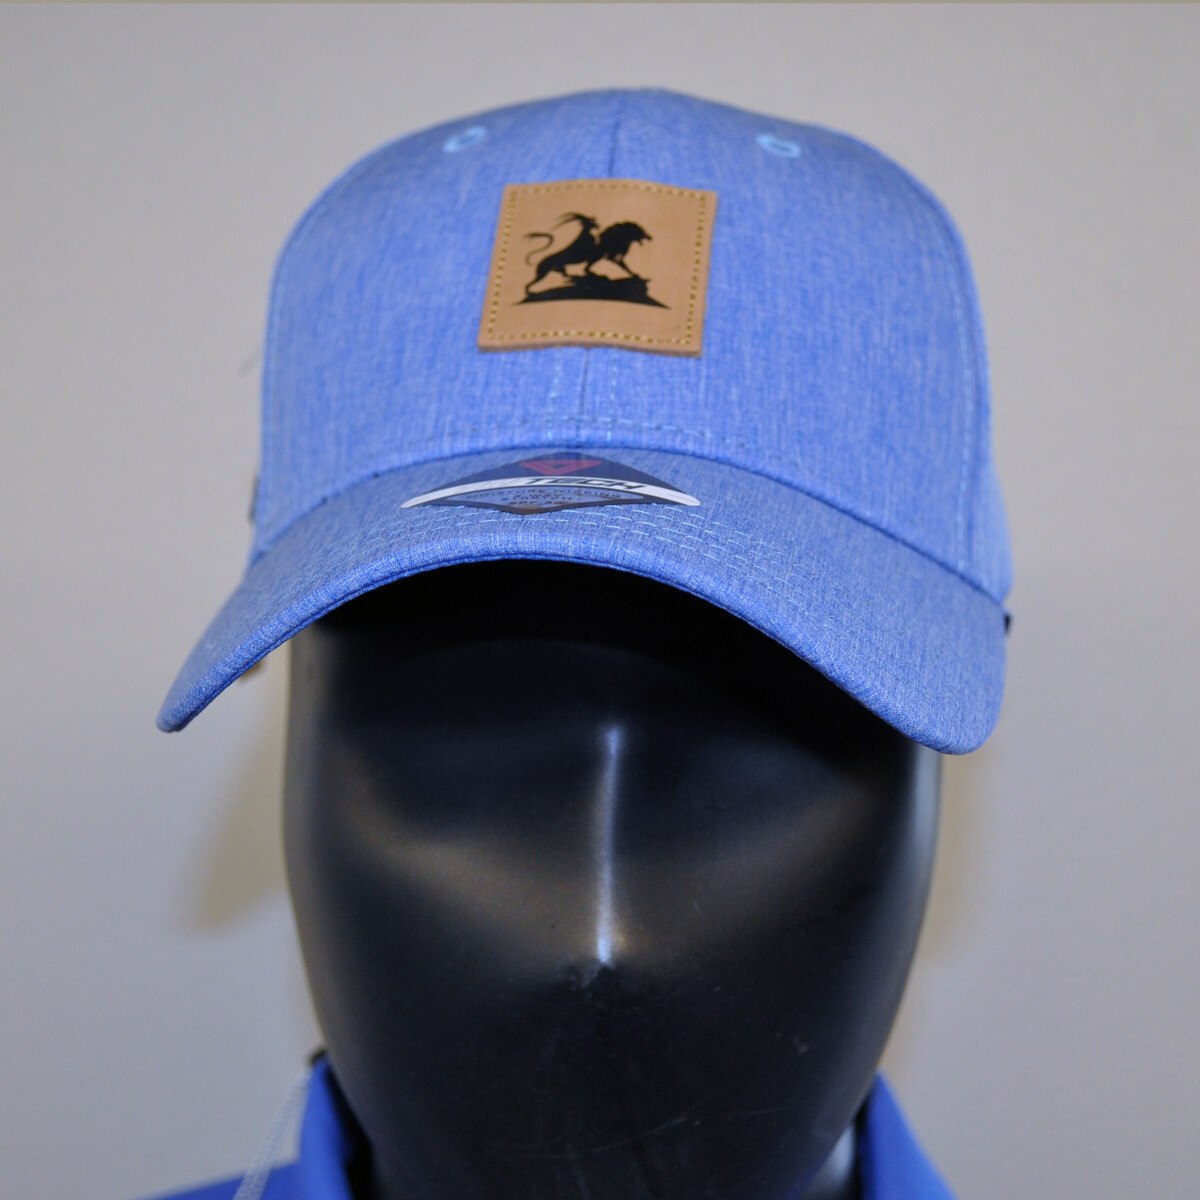 Men's Golf Hat - OSFA Heather Blue/Leather Patch